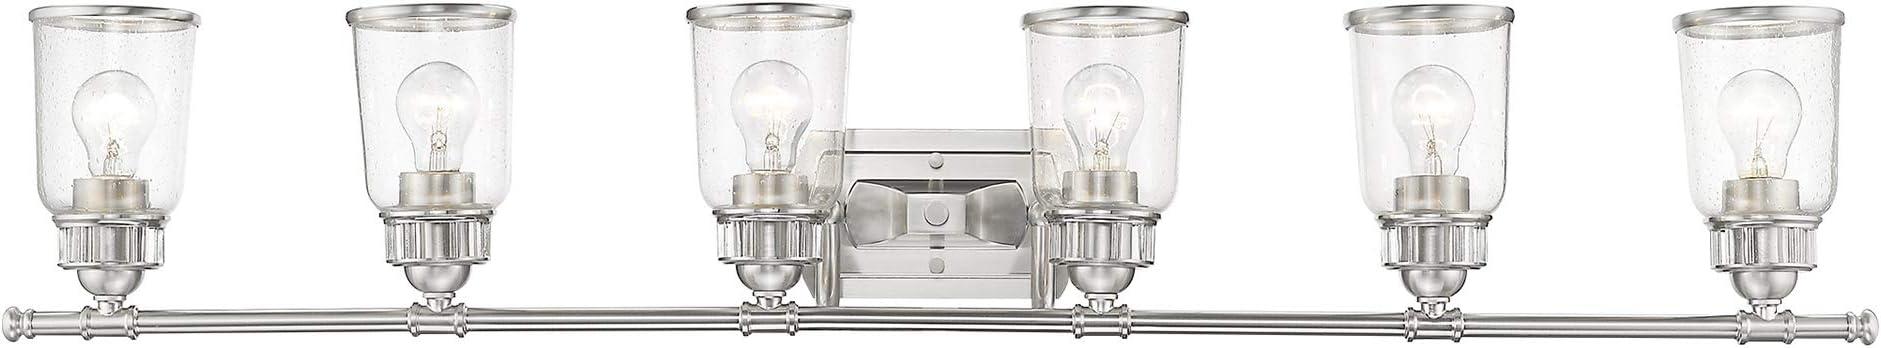 Livex Lighting 10516 91 Lawrenceville 6 Light Bath Vanity Brushed Nickel Amazon Com